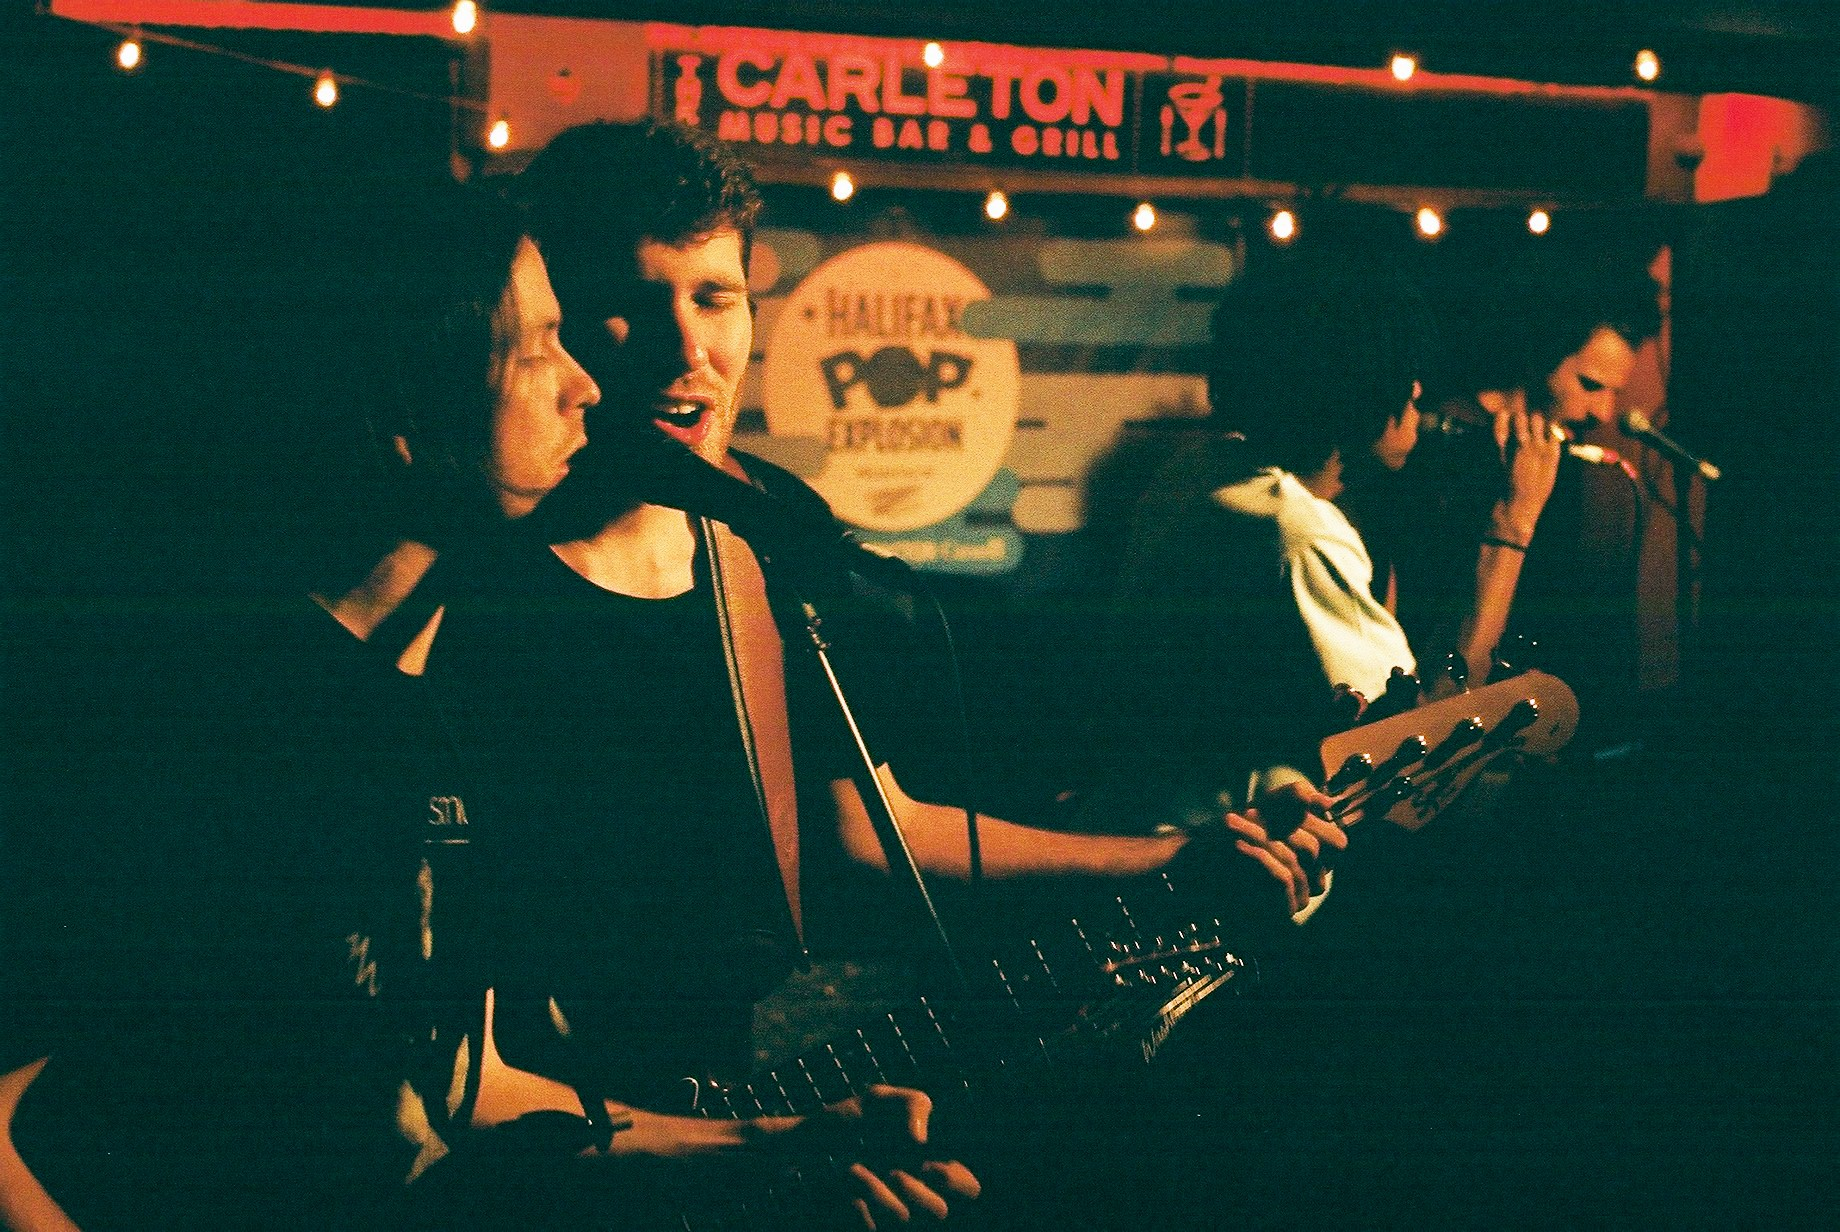 Daniel Caesar at the Carleton - KATE GIFFIN